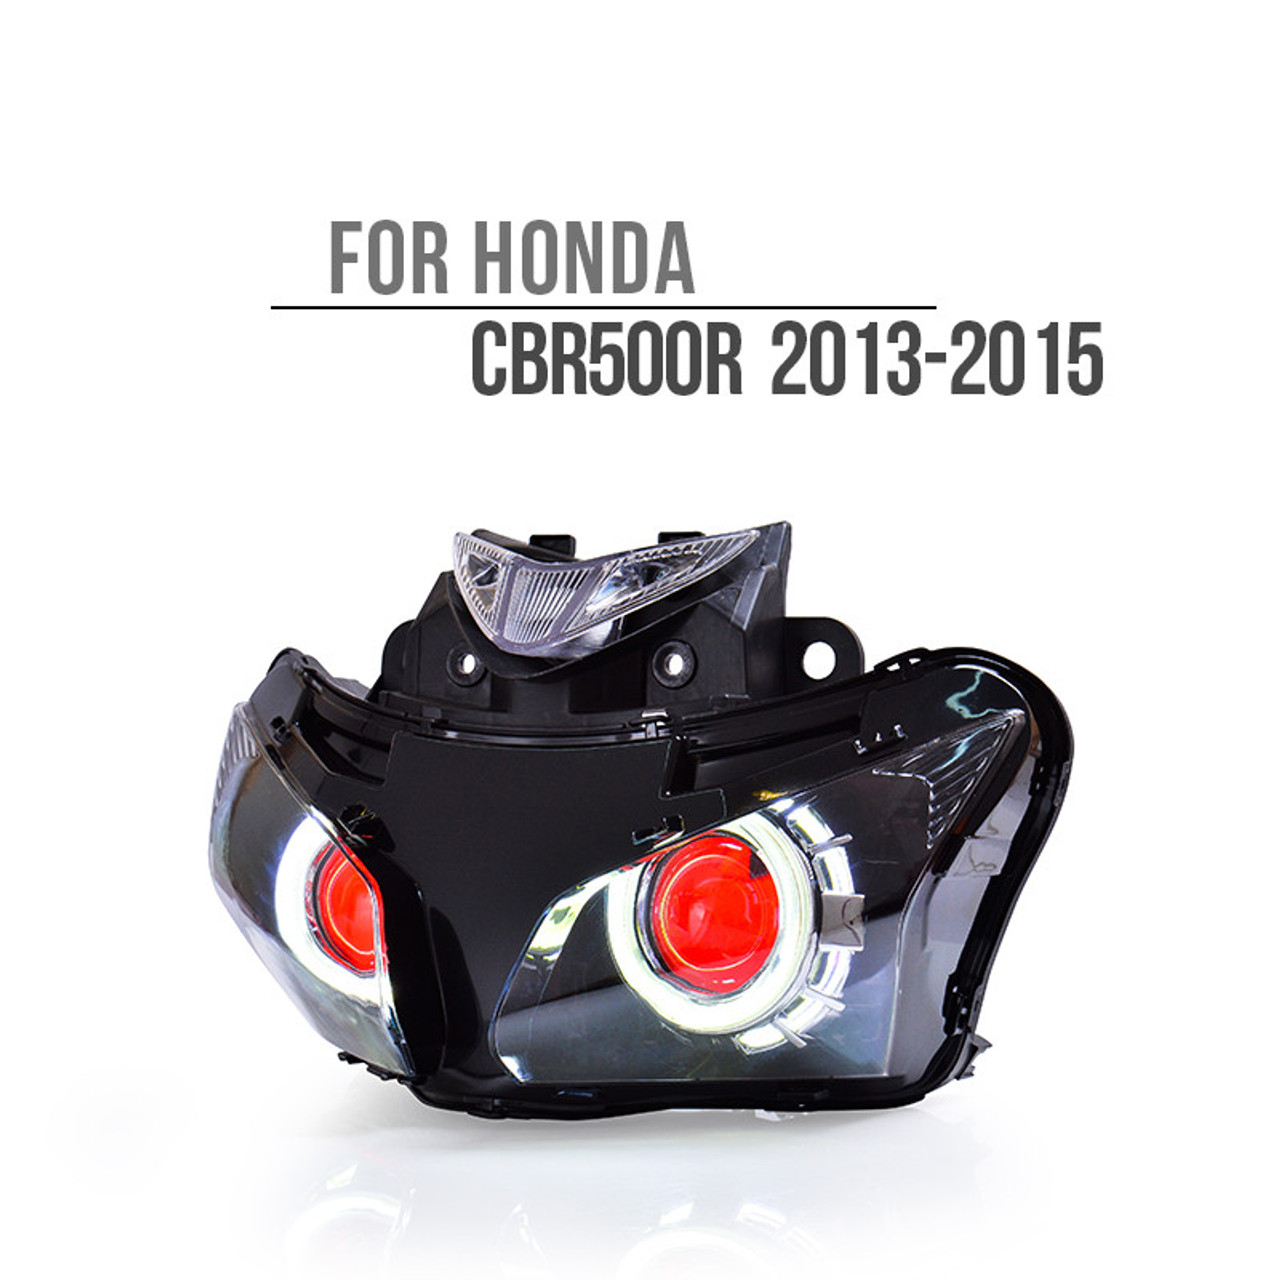 Honda Xr125l 2003 2013 Review: Honda CBR500R LED Headlight 2013 2014 2015